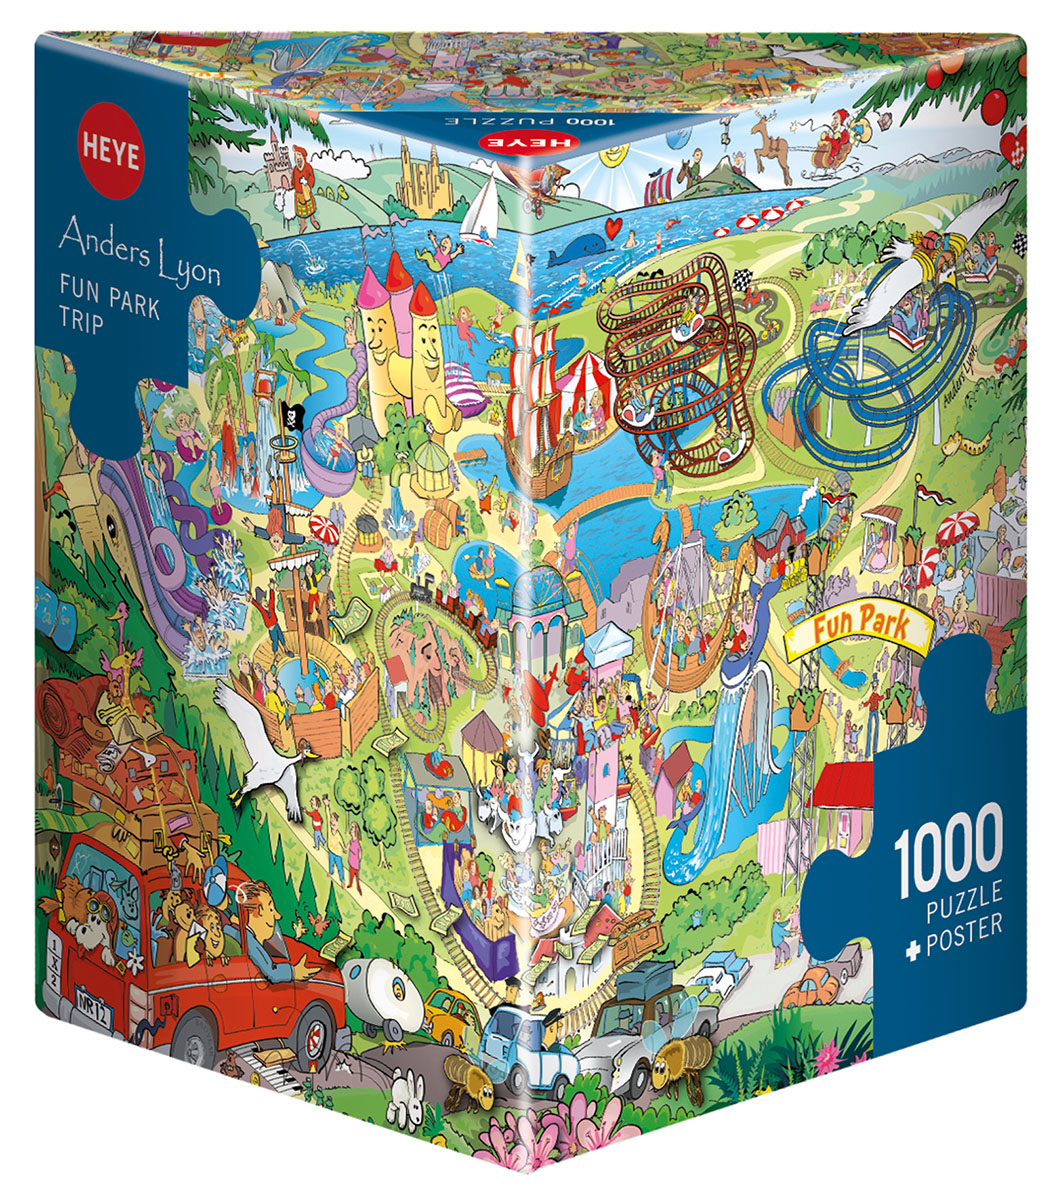 Fun Park Trip, Lyon Cartoons Jigsaw Puzzle